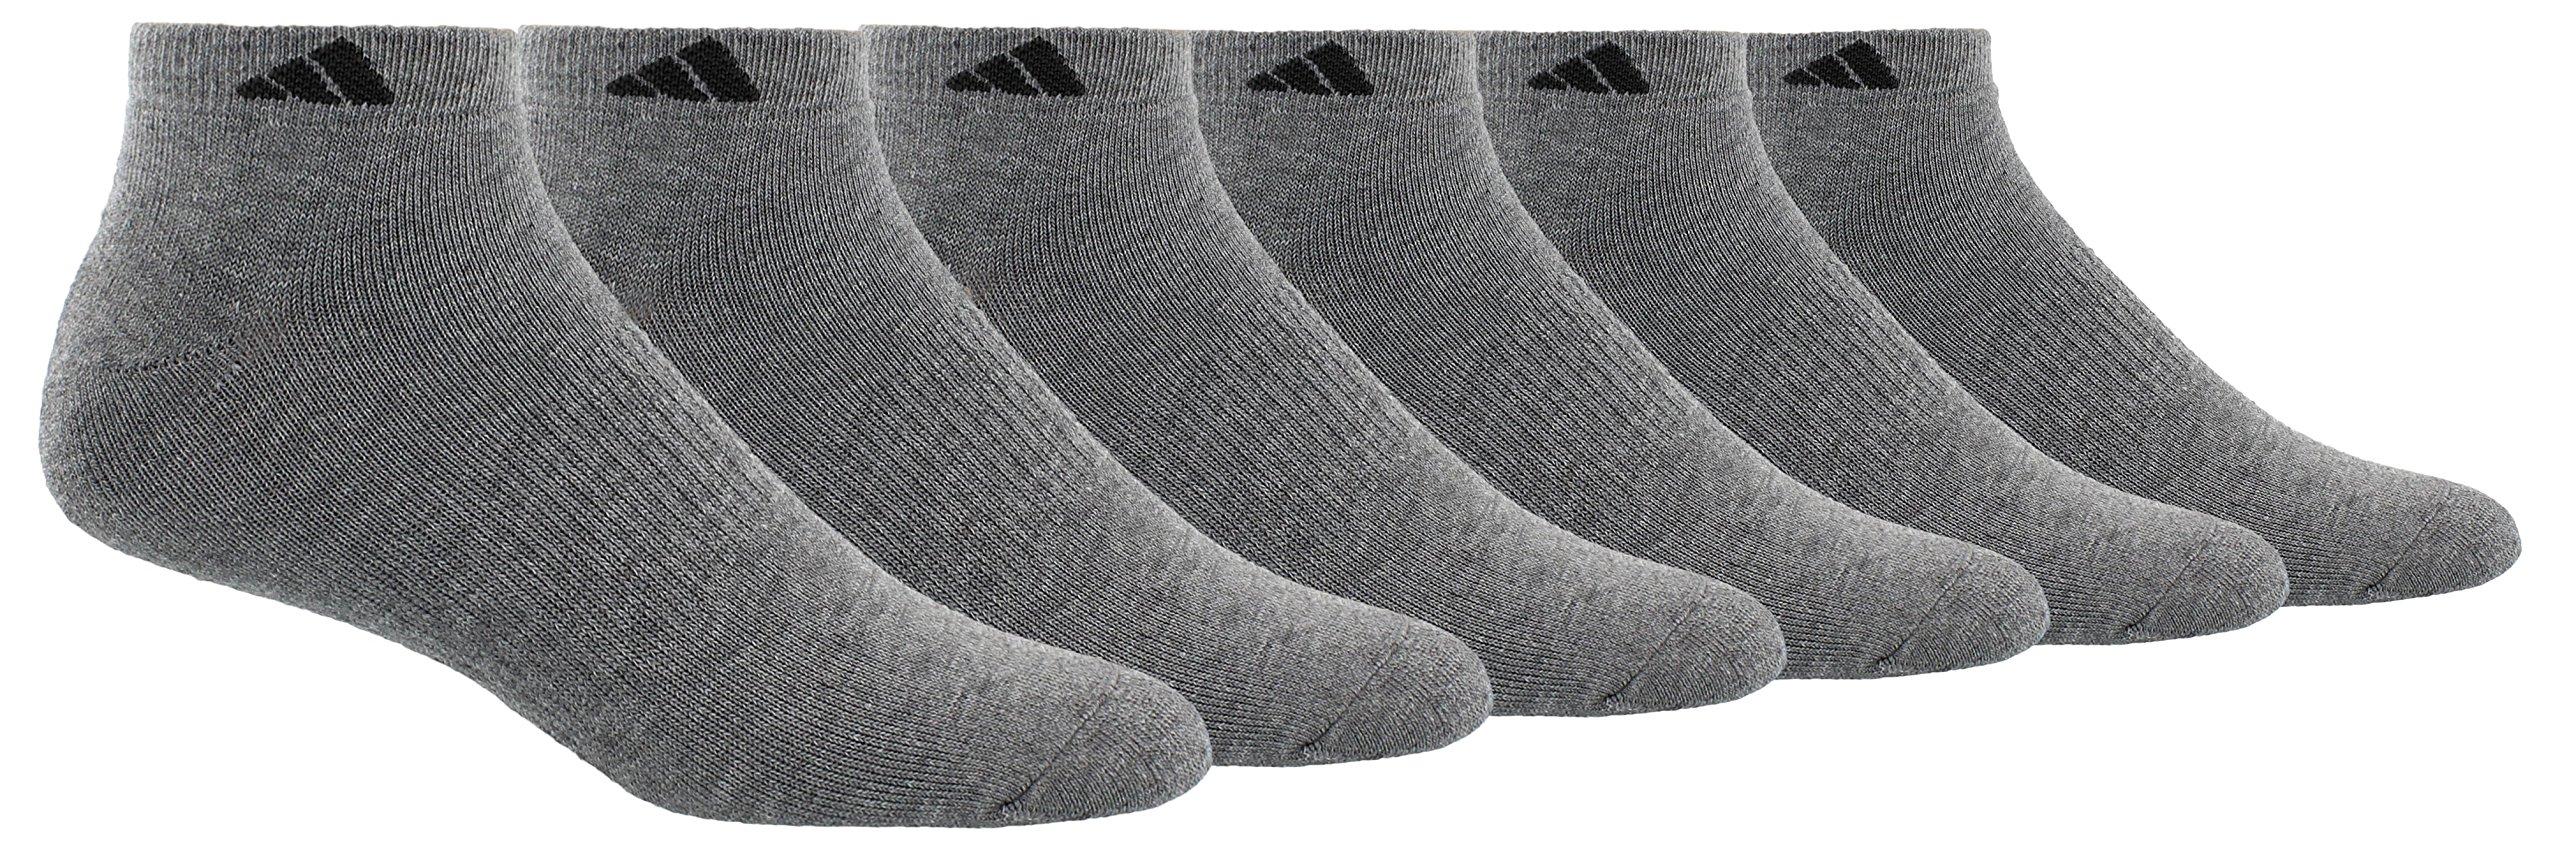 adidas Men's Athletic Low Cut Socks (6 Pack), Heather Grey/Black, regular: 6-12